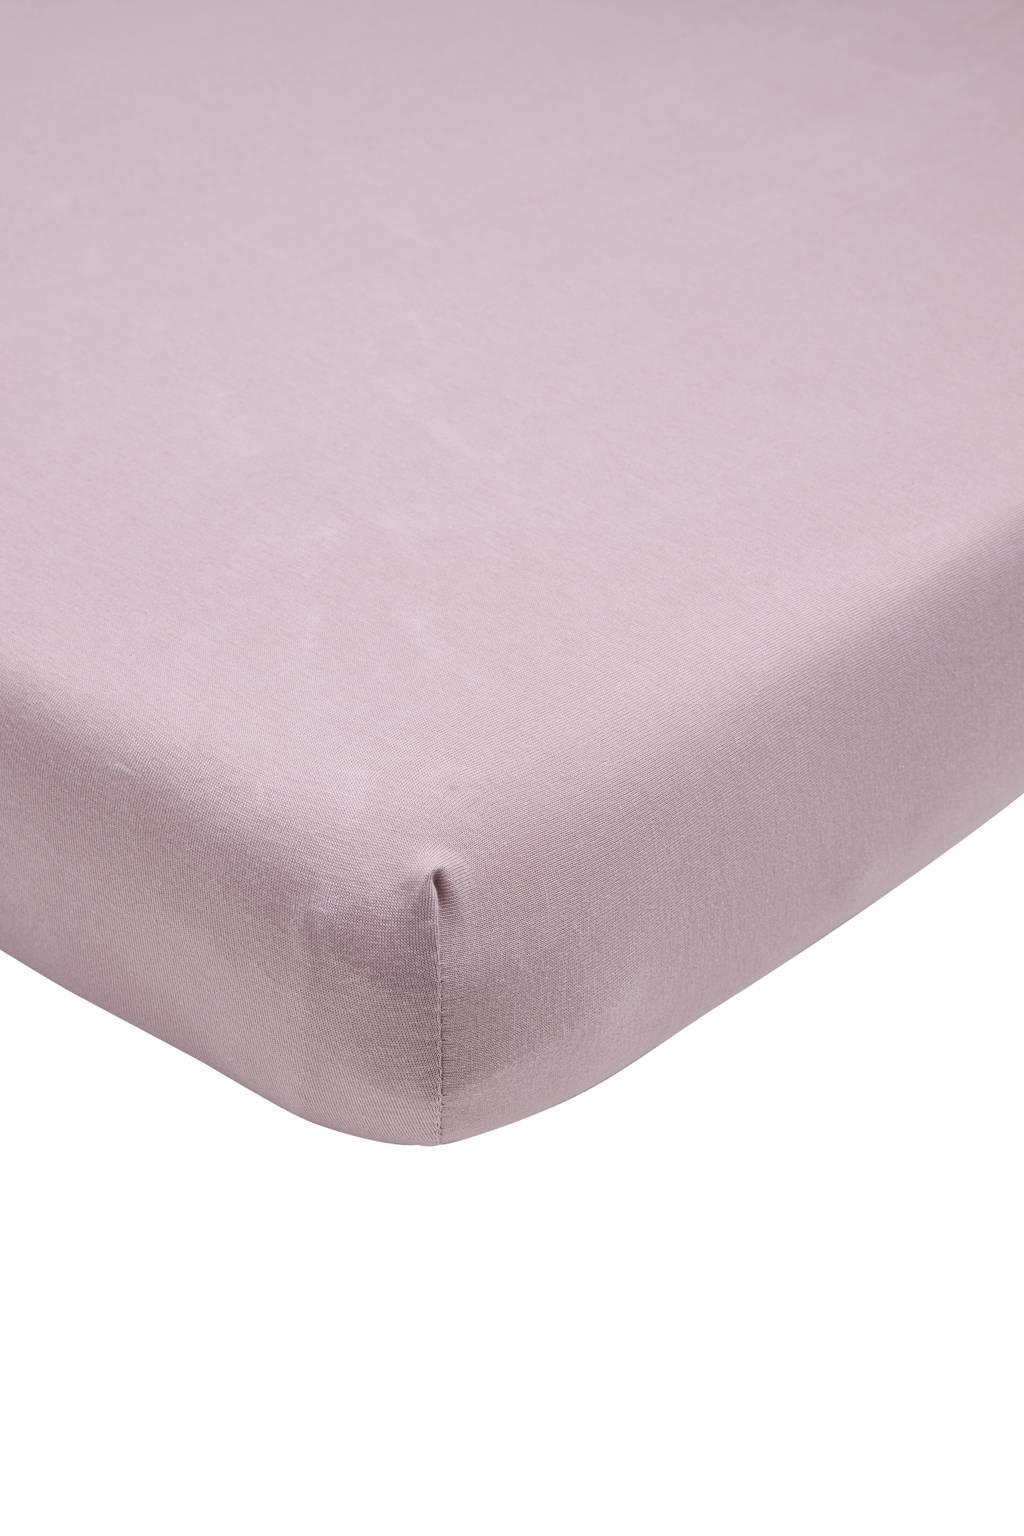 Meyco katoenen jersey hoeslaken peuter 70x140/150 cm lilac Lila